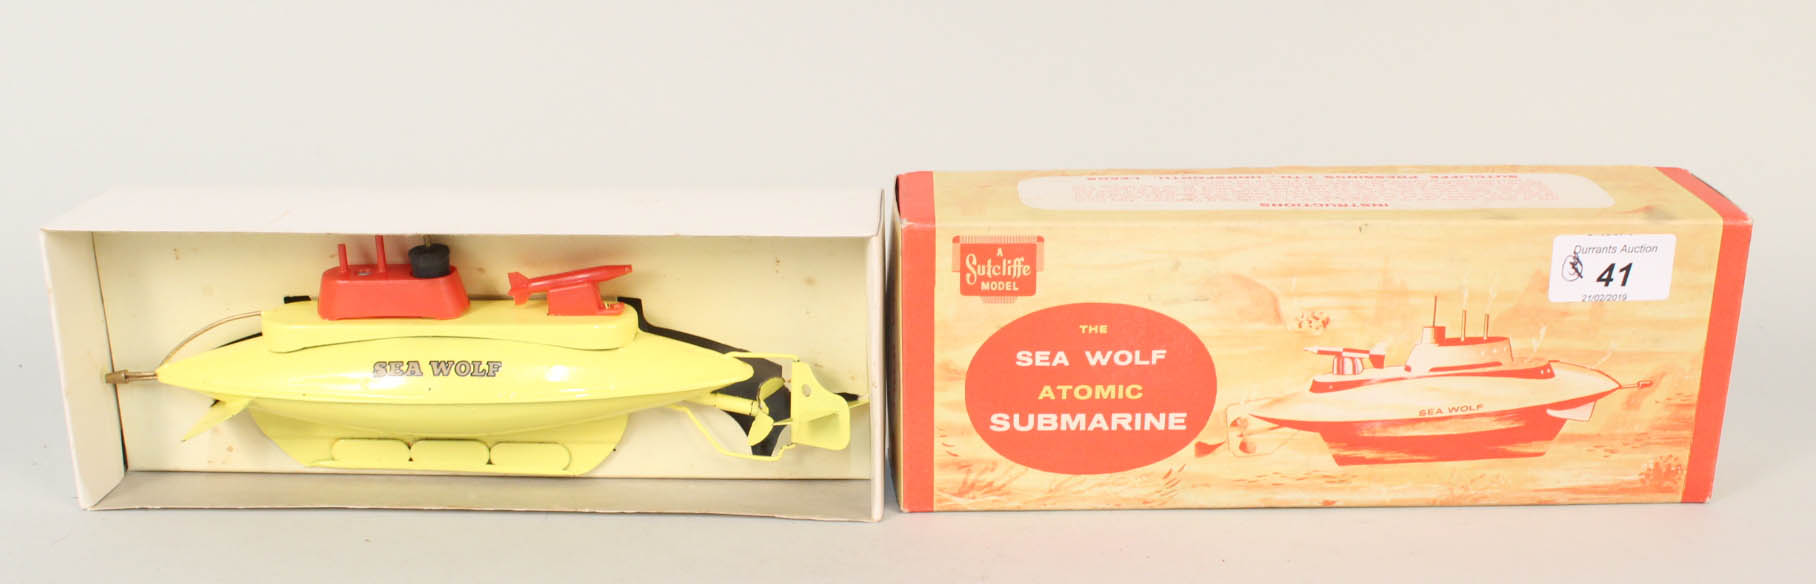 Lot 41 - A boxed Sutcliffe Sea Wolf Atomic Submarine,